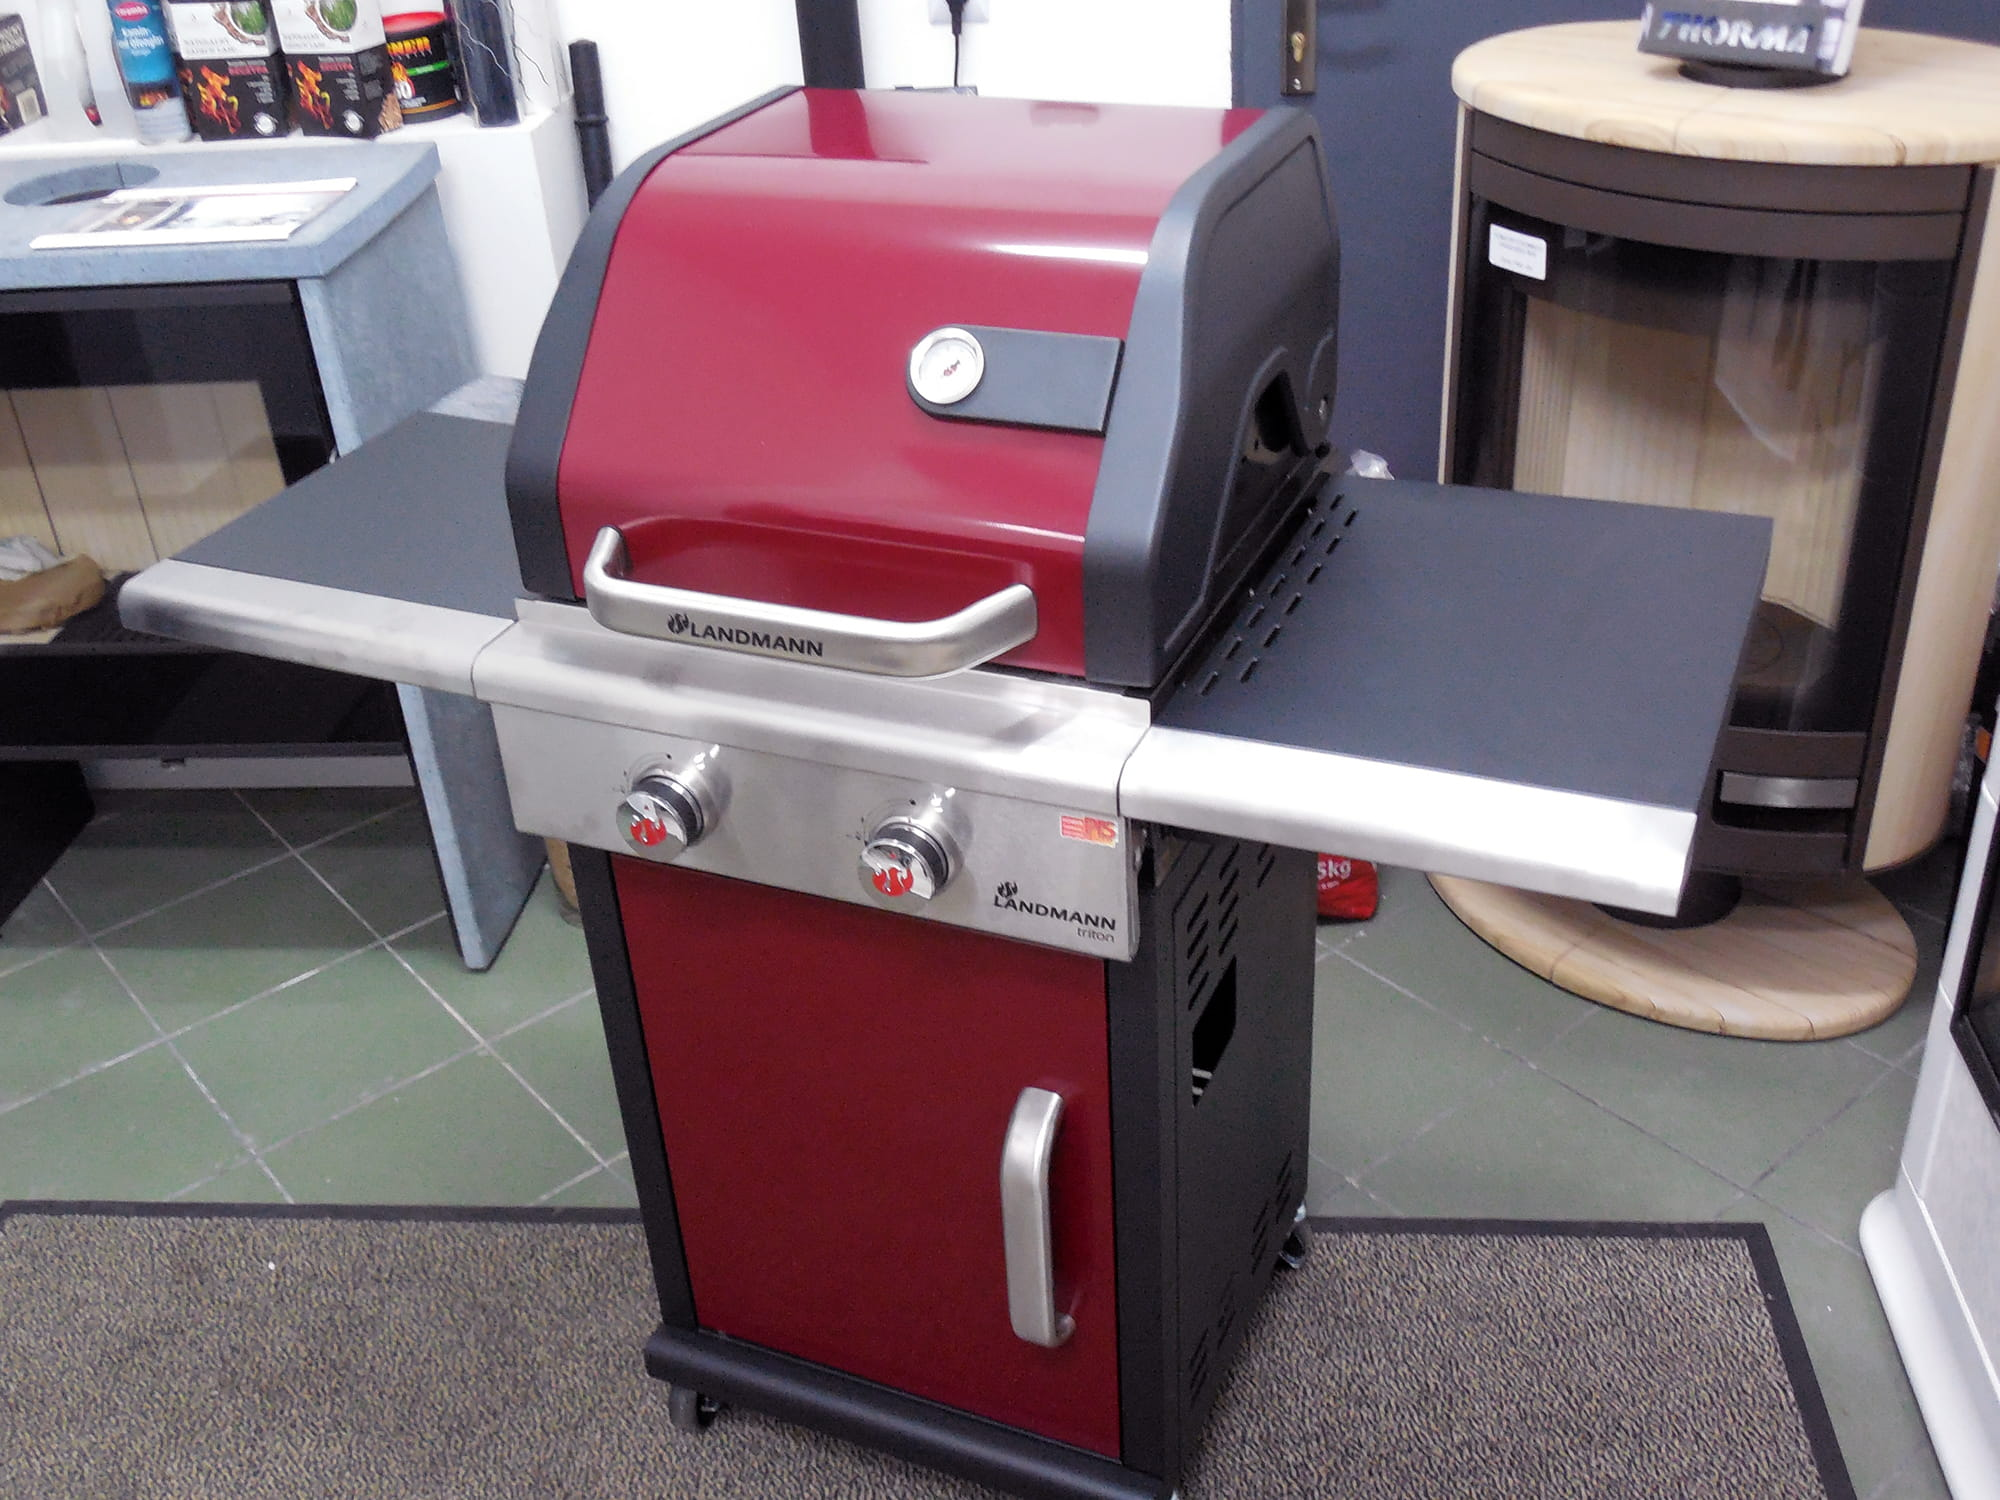 grill gazowy landmann triton pts 2 0 bordowy 12902 sklep z grillami grille. Black Bedroom Furniture Sets. Home Design Ideas